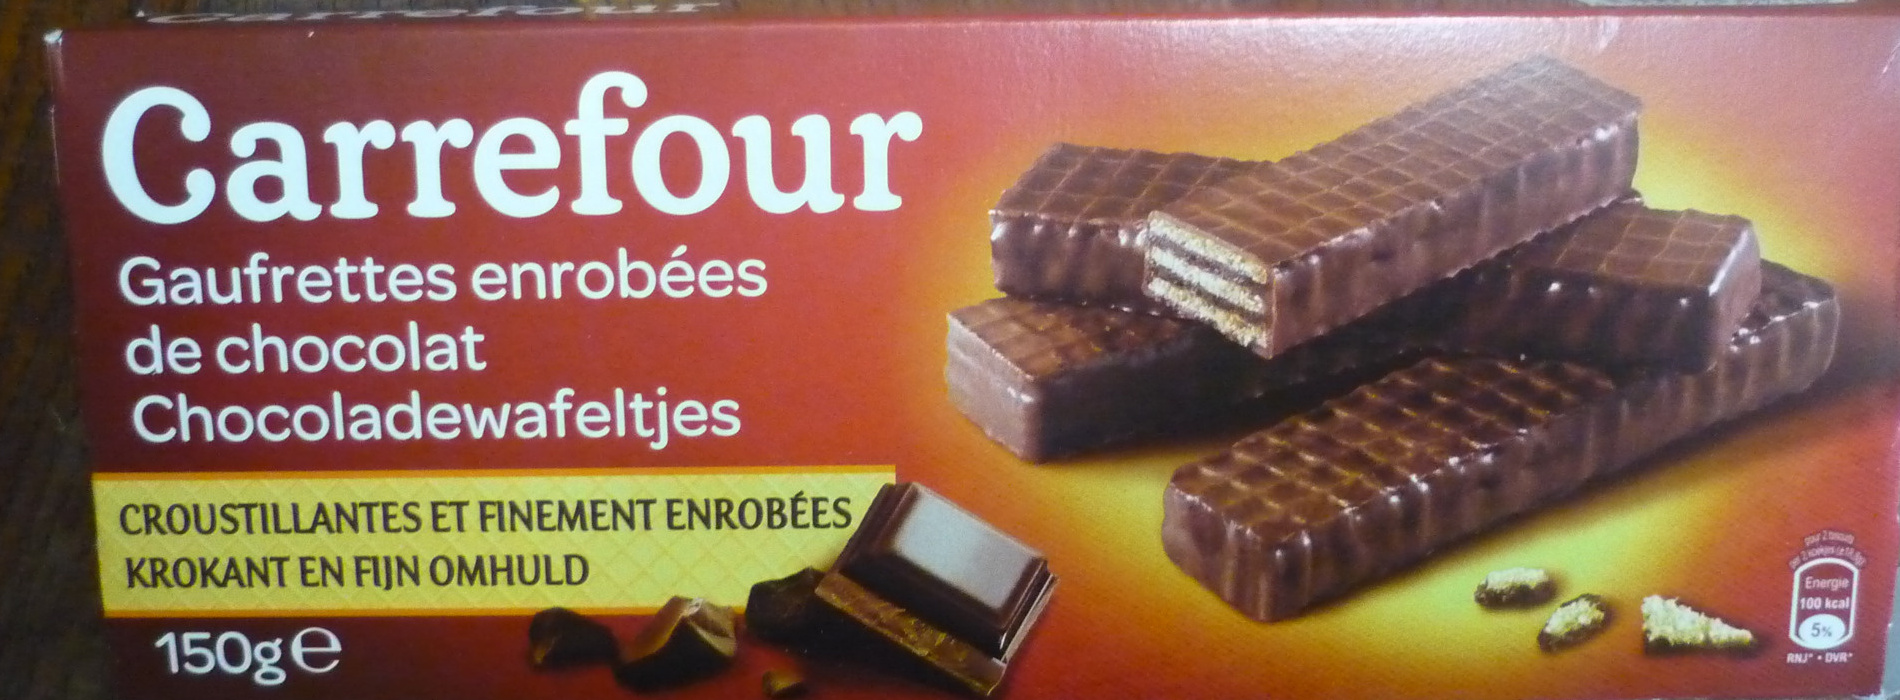 gaufrettes enrob es de chocolat carrefour 150 g 16 biscuits. Black Bedroom Furniture Sets. Home Design Ideas